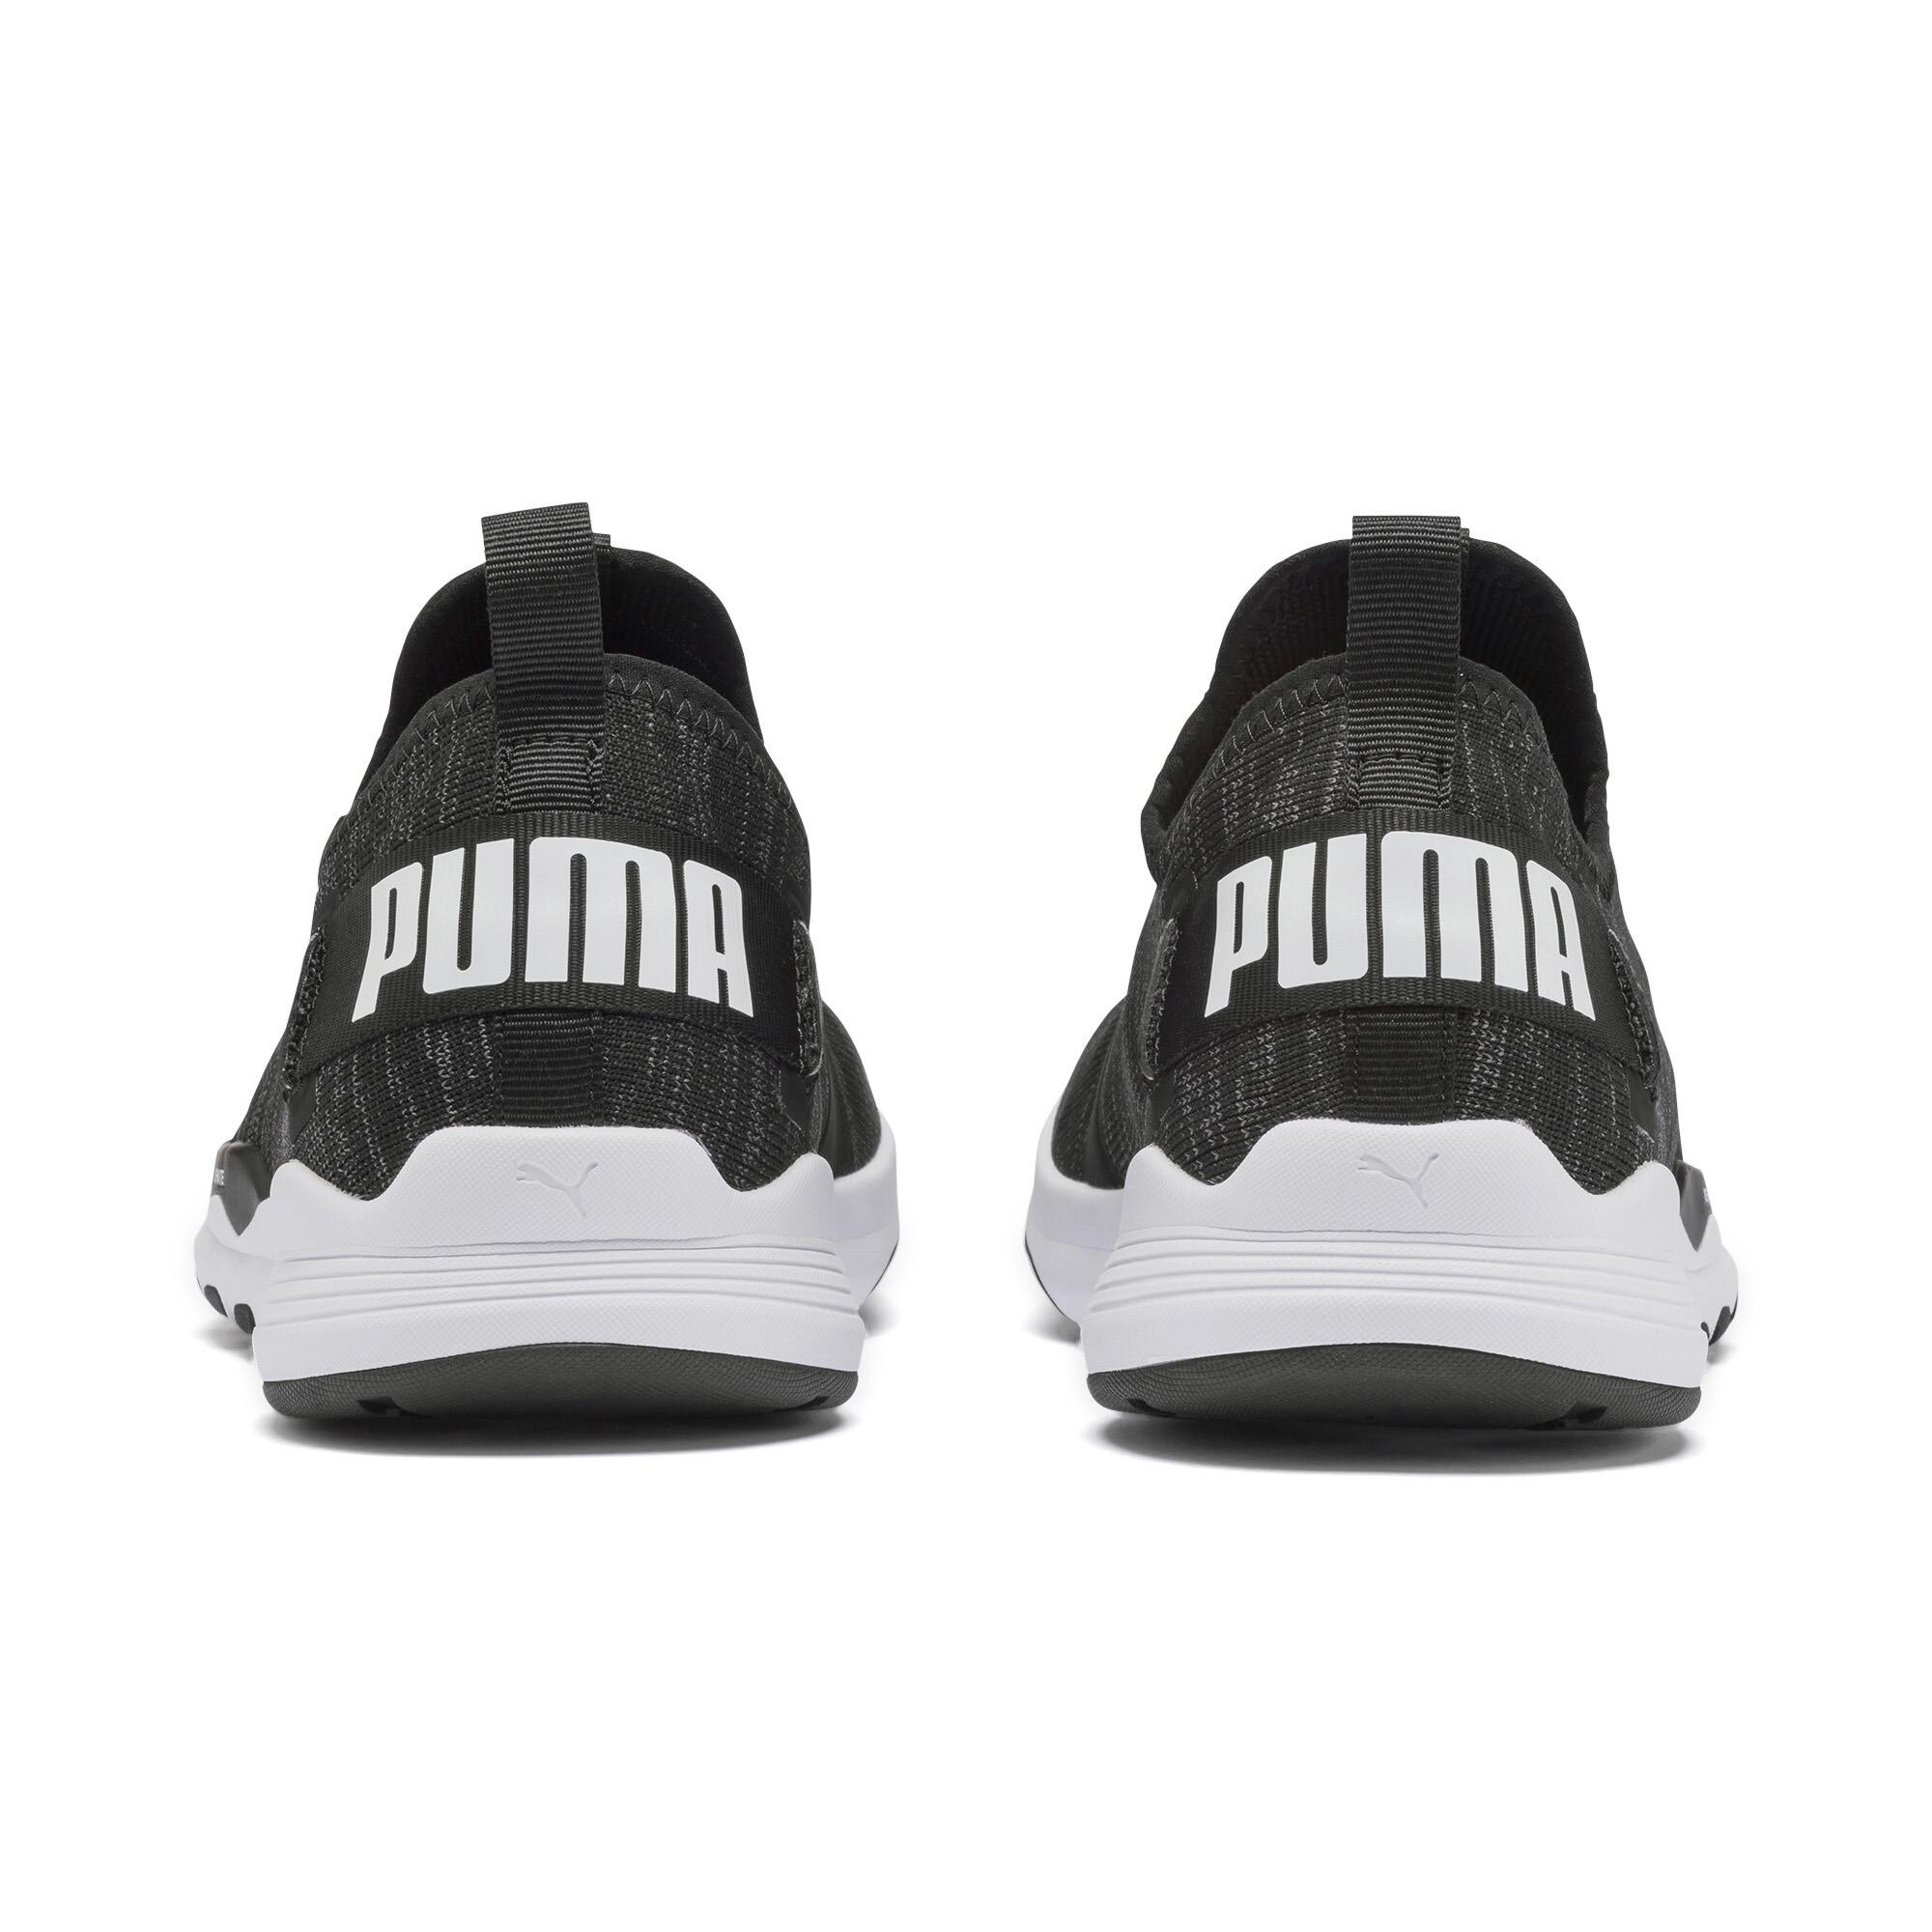 PUMA-Men-039-s-IGNITE-Contender-Knit-Running-Shoes thumbnail 8